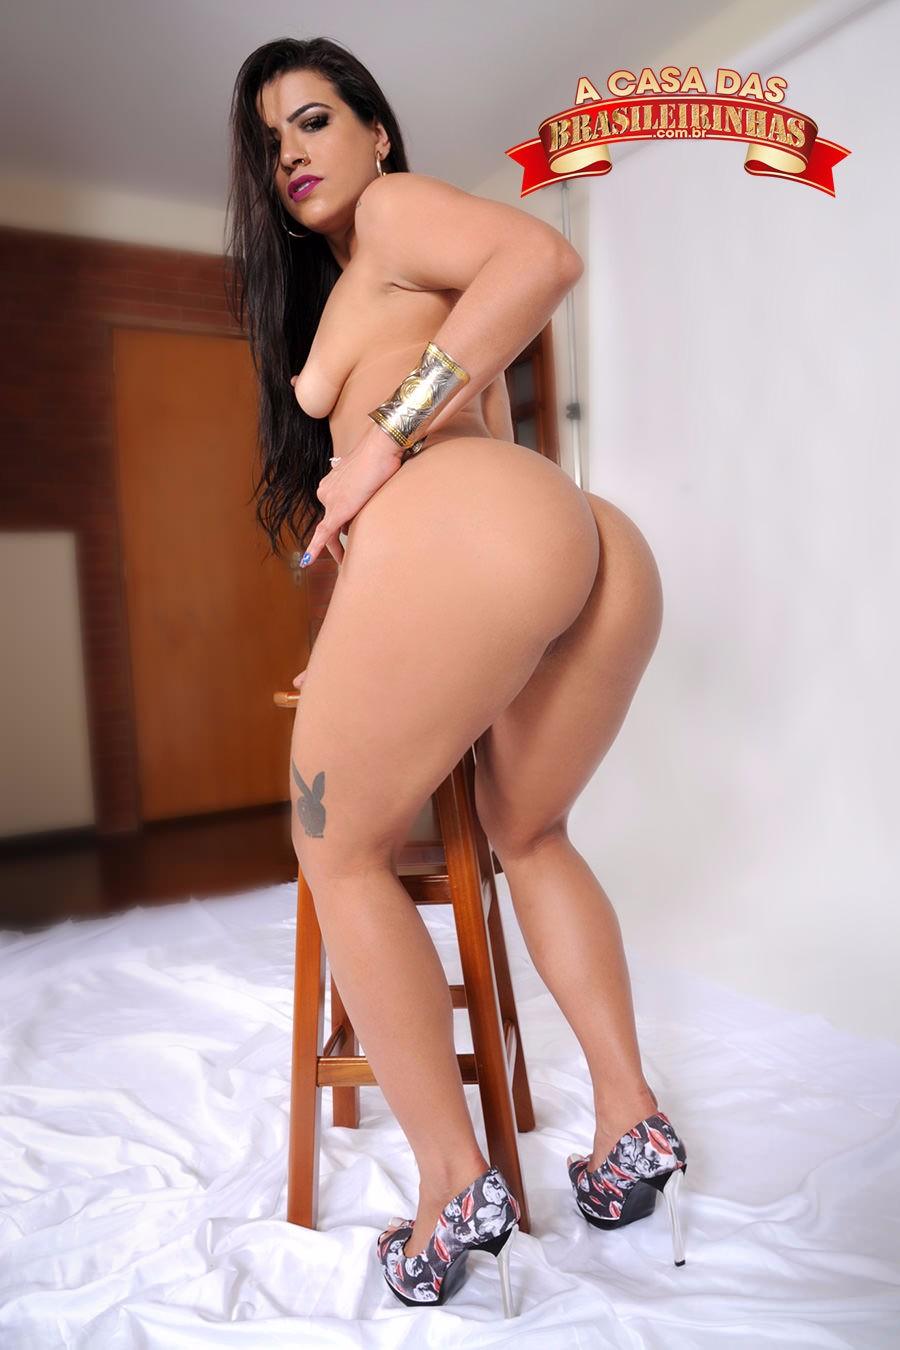 Aline-Rios-seduzindo.jpg